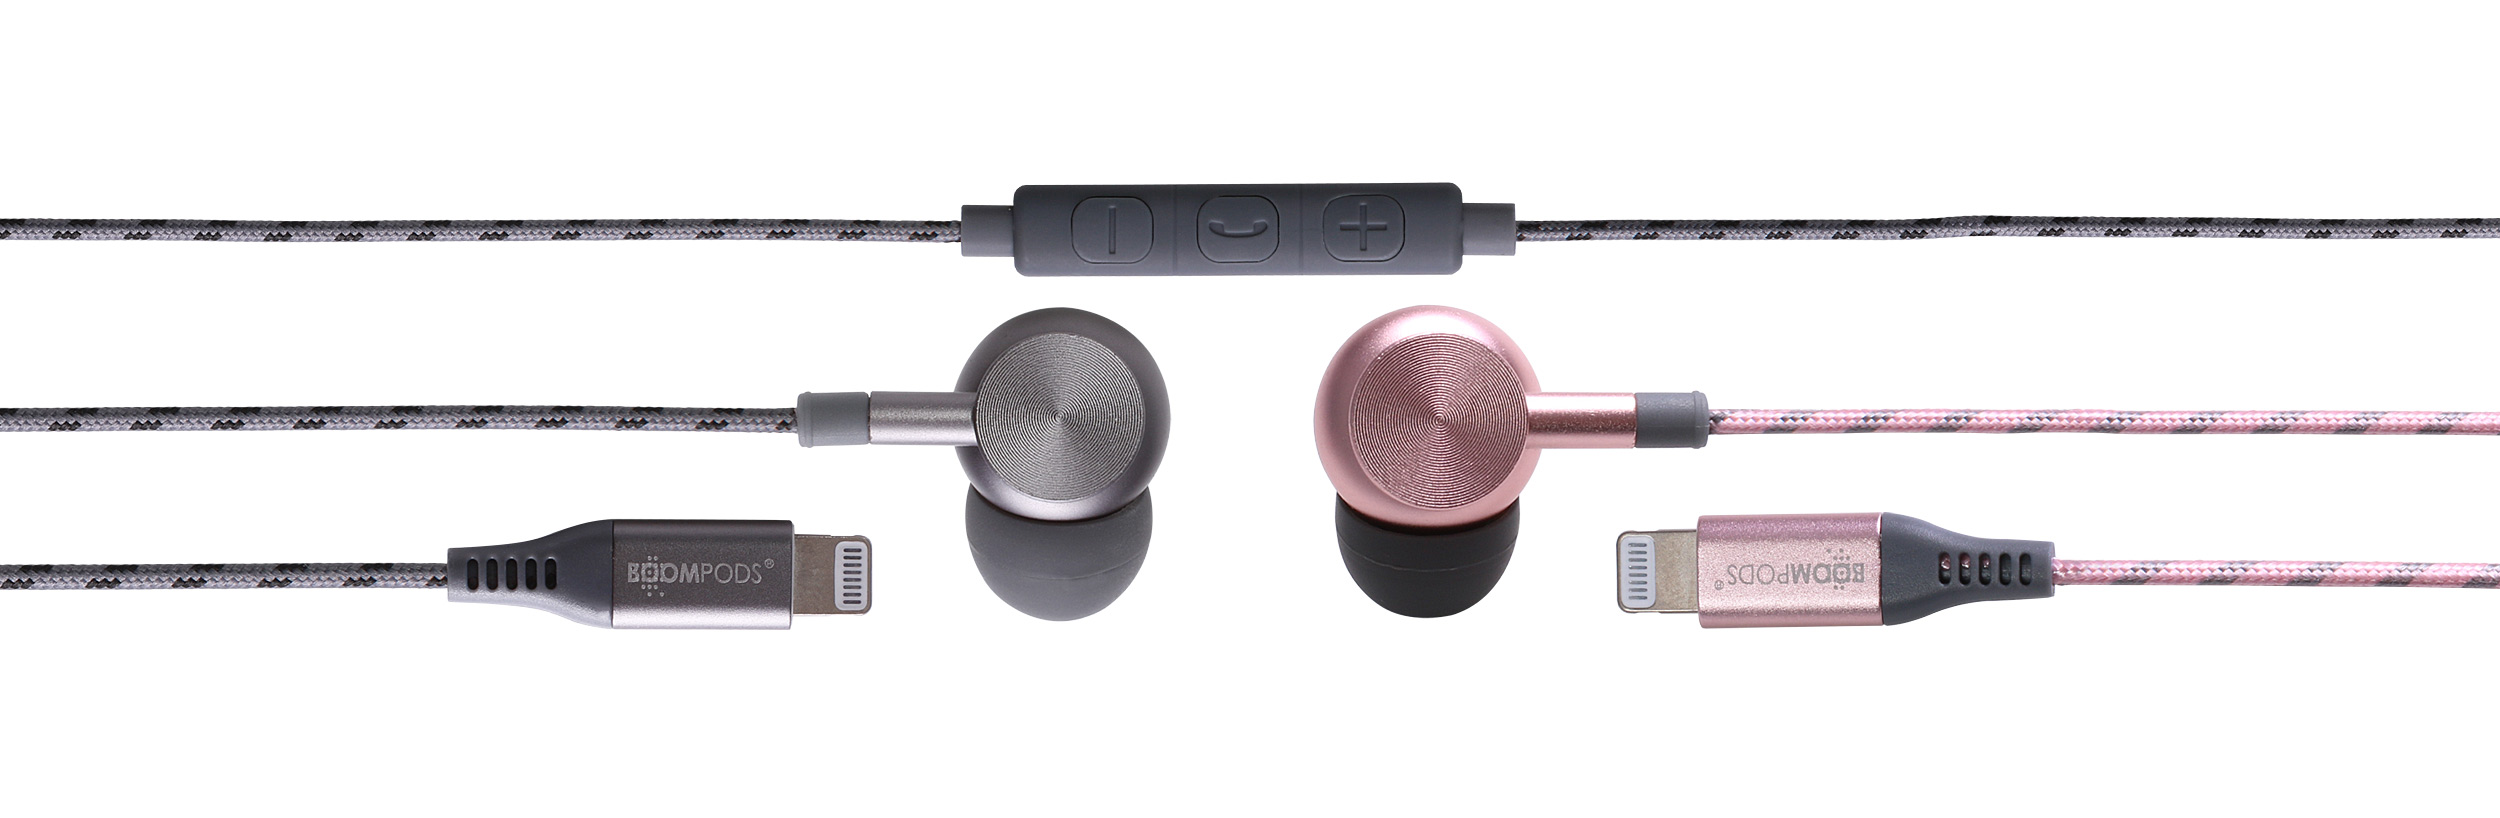 Boompods digibuds headphones